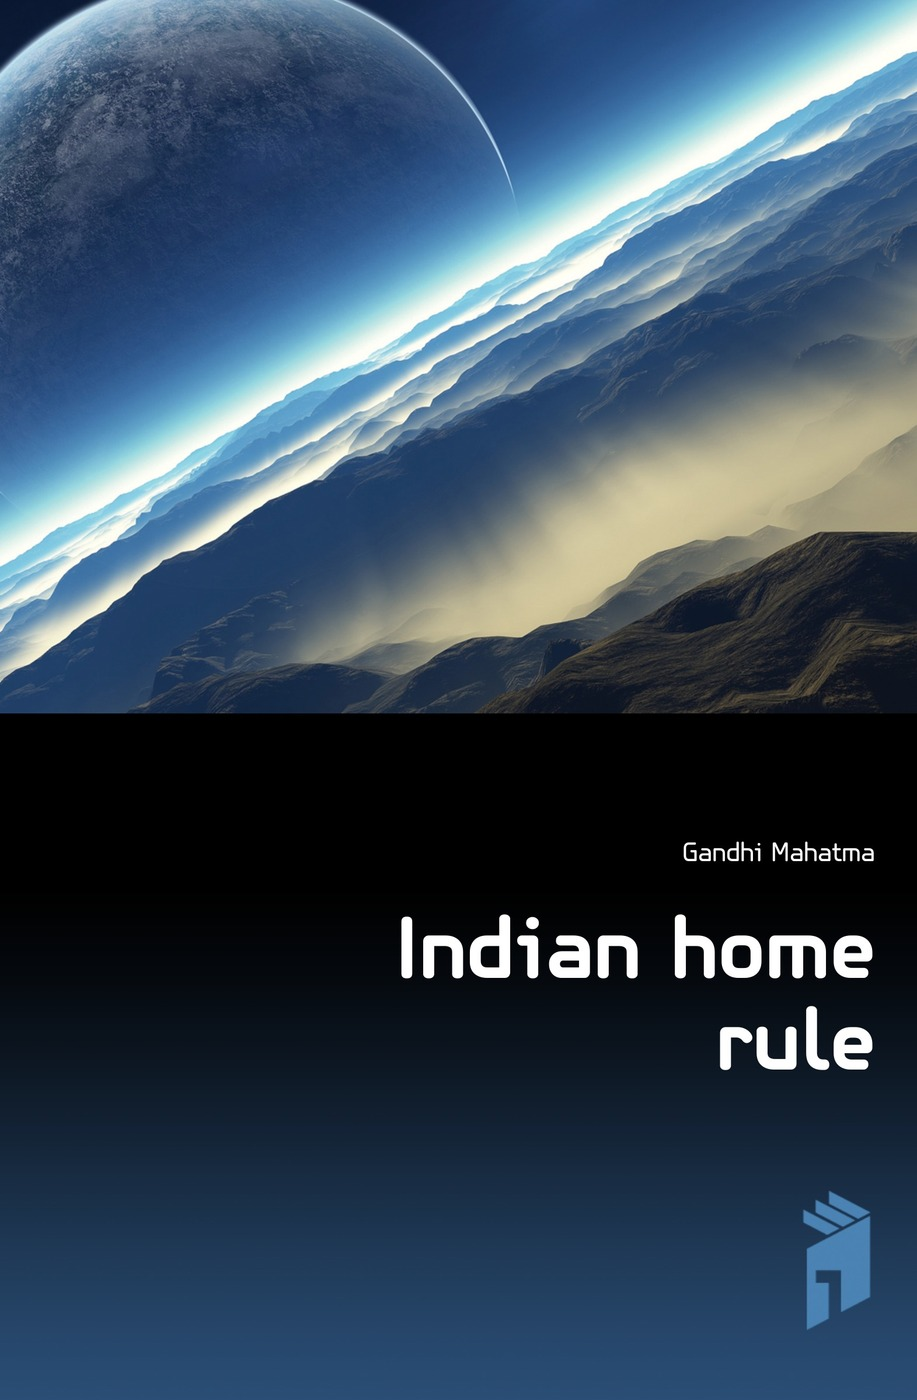 Gandhi Mahatma Indian home rule gandhi mahatma third class in indian railways